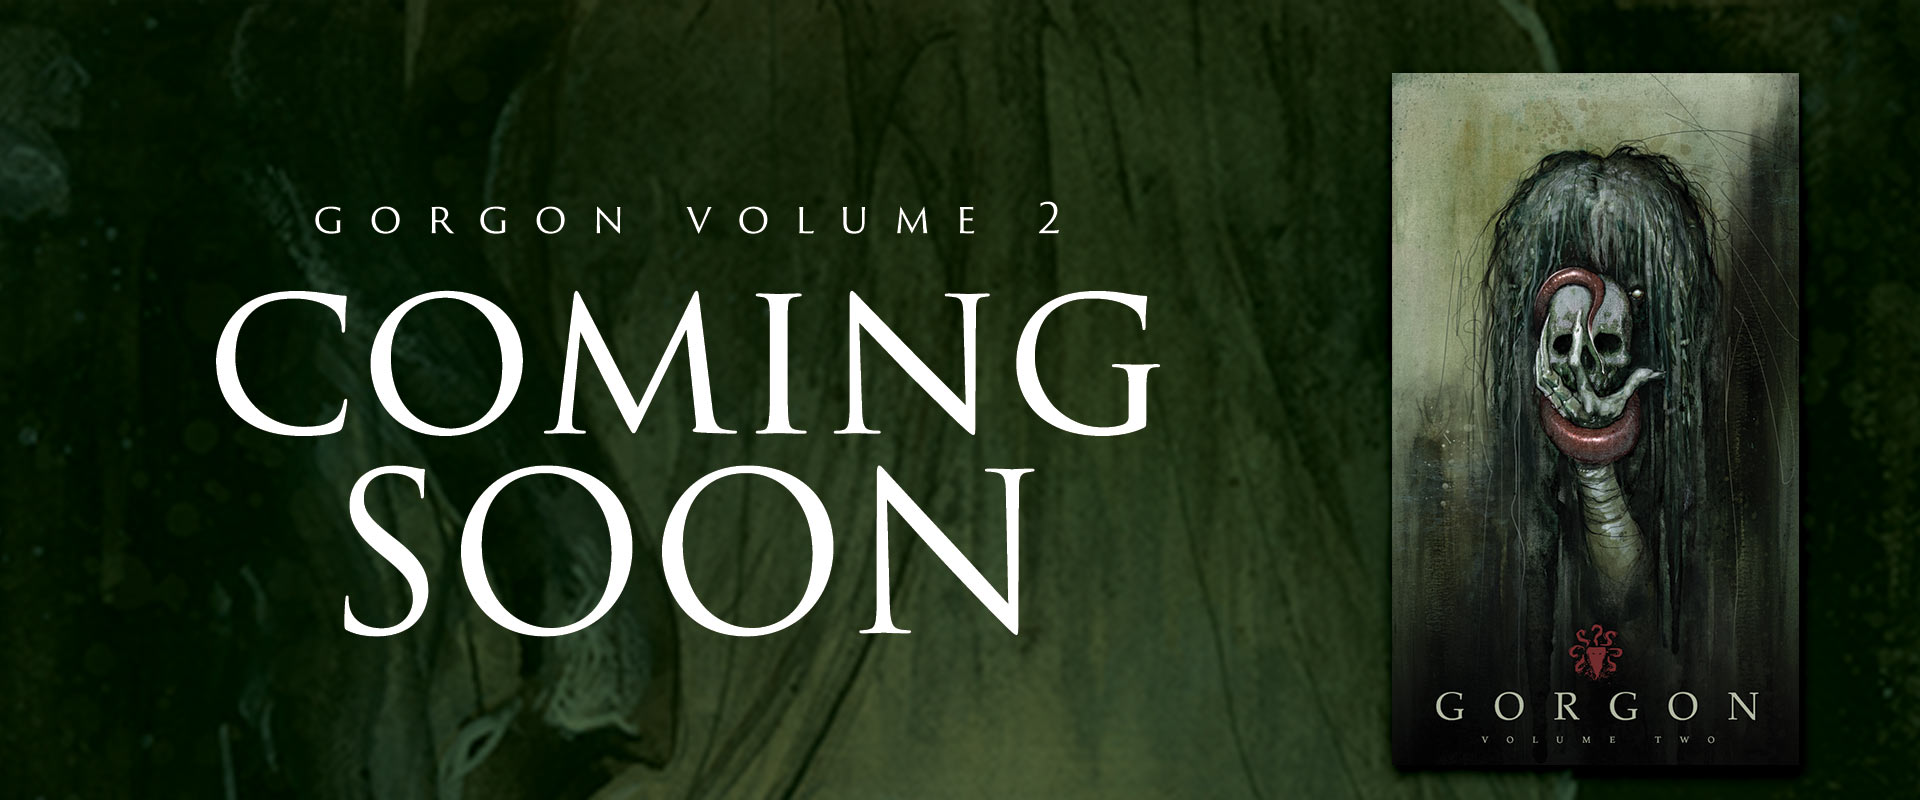 Gorgon Vol 2 Coming Soon